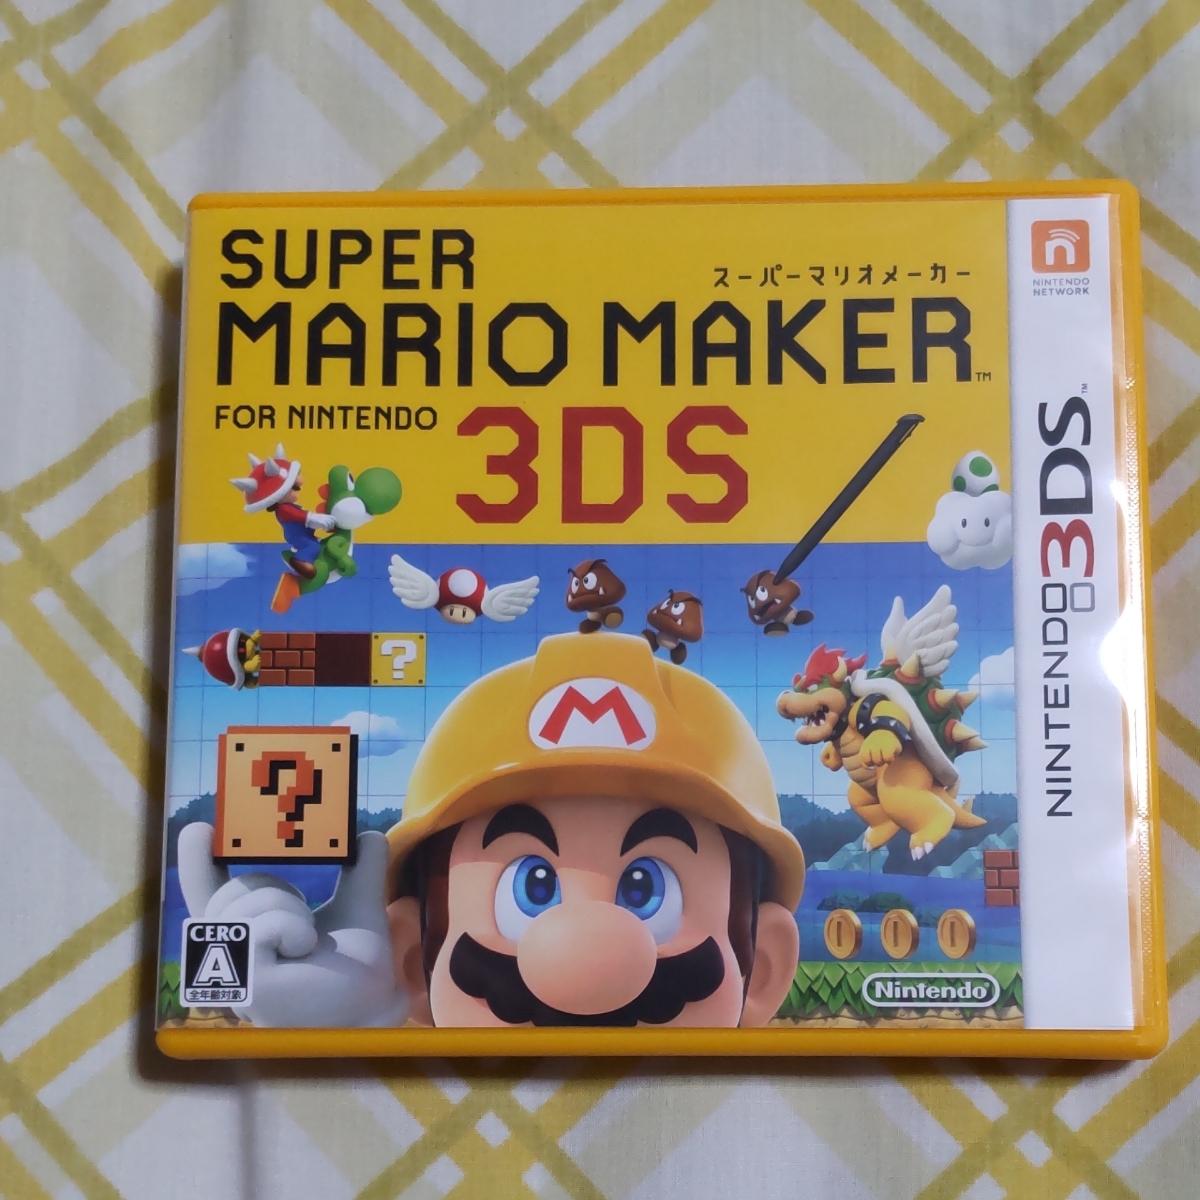 スーパーマリオメーカー スーパーマリオメーカー3DS 3DS ニンテンドー3DS マリオメーカー 3DSソフト